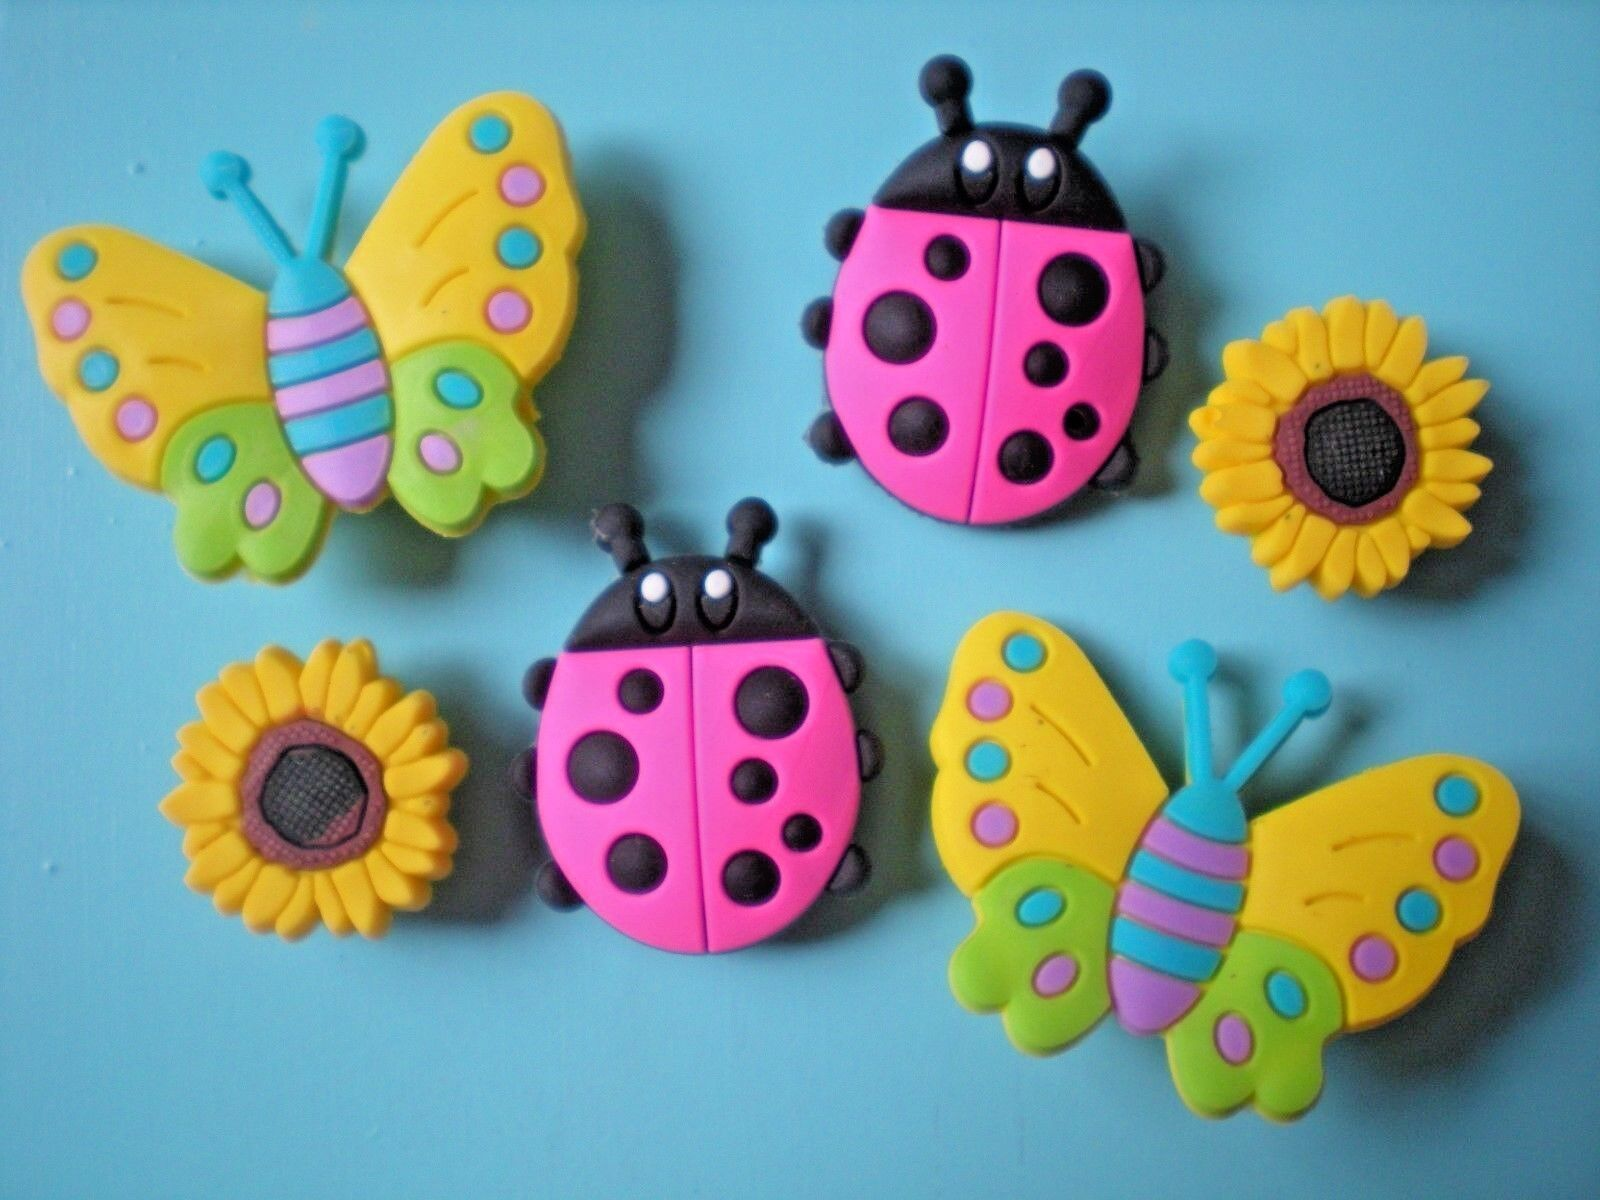 Clog Shoe Charm Plug Accessories Sandal Bracelet 6 Beetle Butterfly